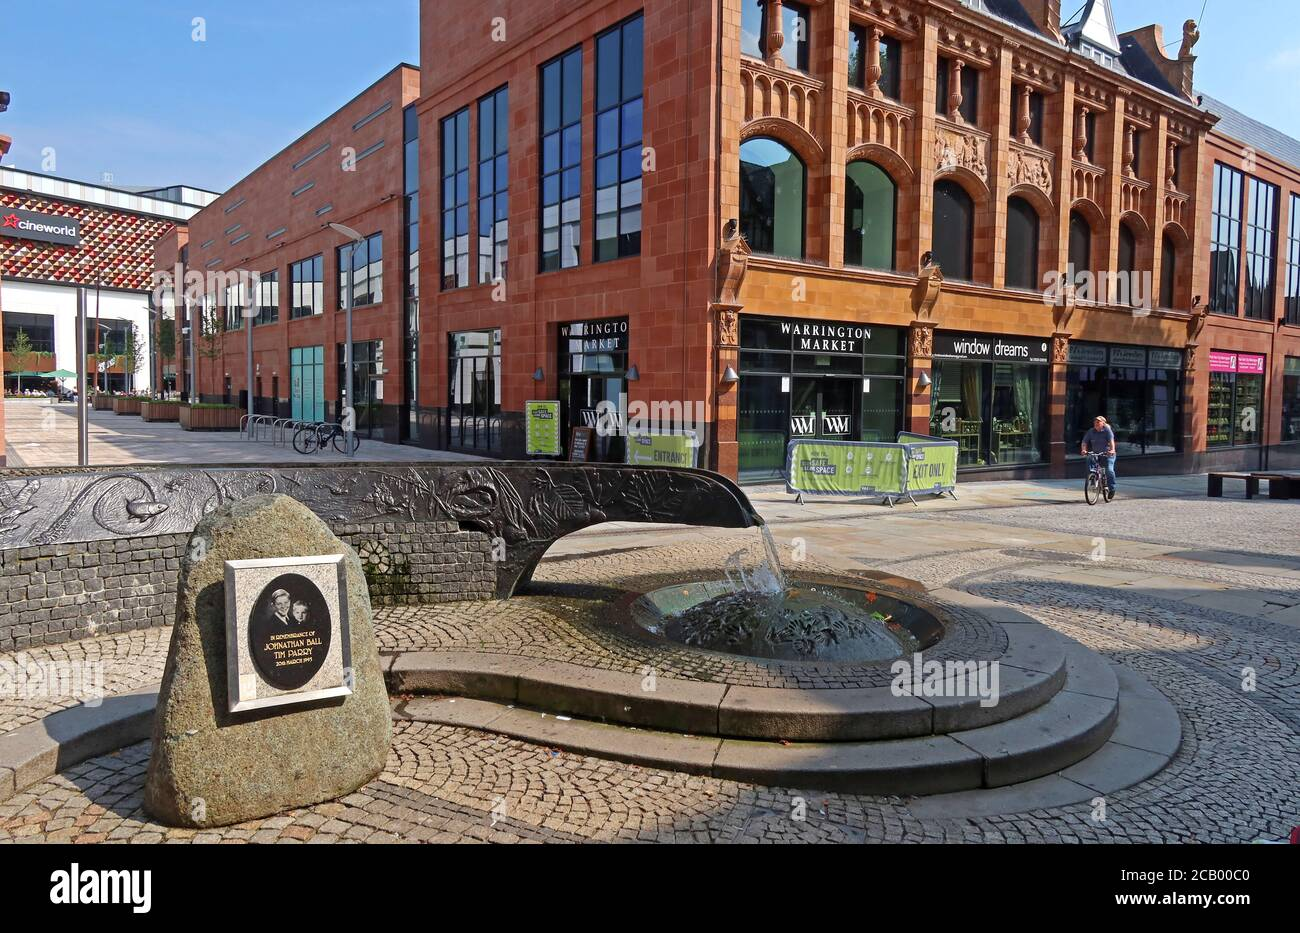 HotpixUK,@HotpixUK,GoTonySmith,Warrington,Cheshire,England,UK,retail,new retail development,VINCI Construction,BroadbentStudio,Broadbent,Studio,art,artwork,IRA,bomb,bombing,town,1996,1993,peace,terror,terrorism,Irish,Northern Ireland,Good Friday,Peace Agreement,tear shaped,water feature,bronze channel,hand prints,handprints,Tim,Jonathan,pedestrianised,Colin Parry,Wendy Parry,WA1